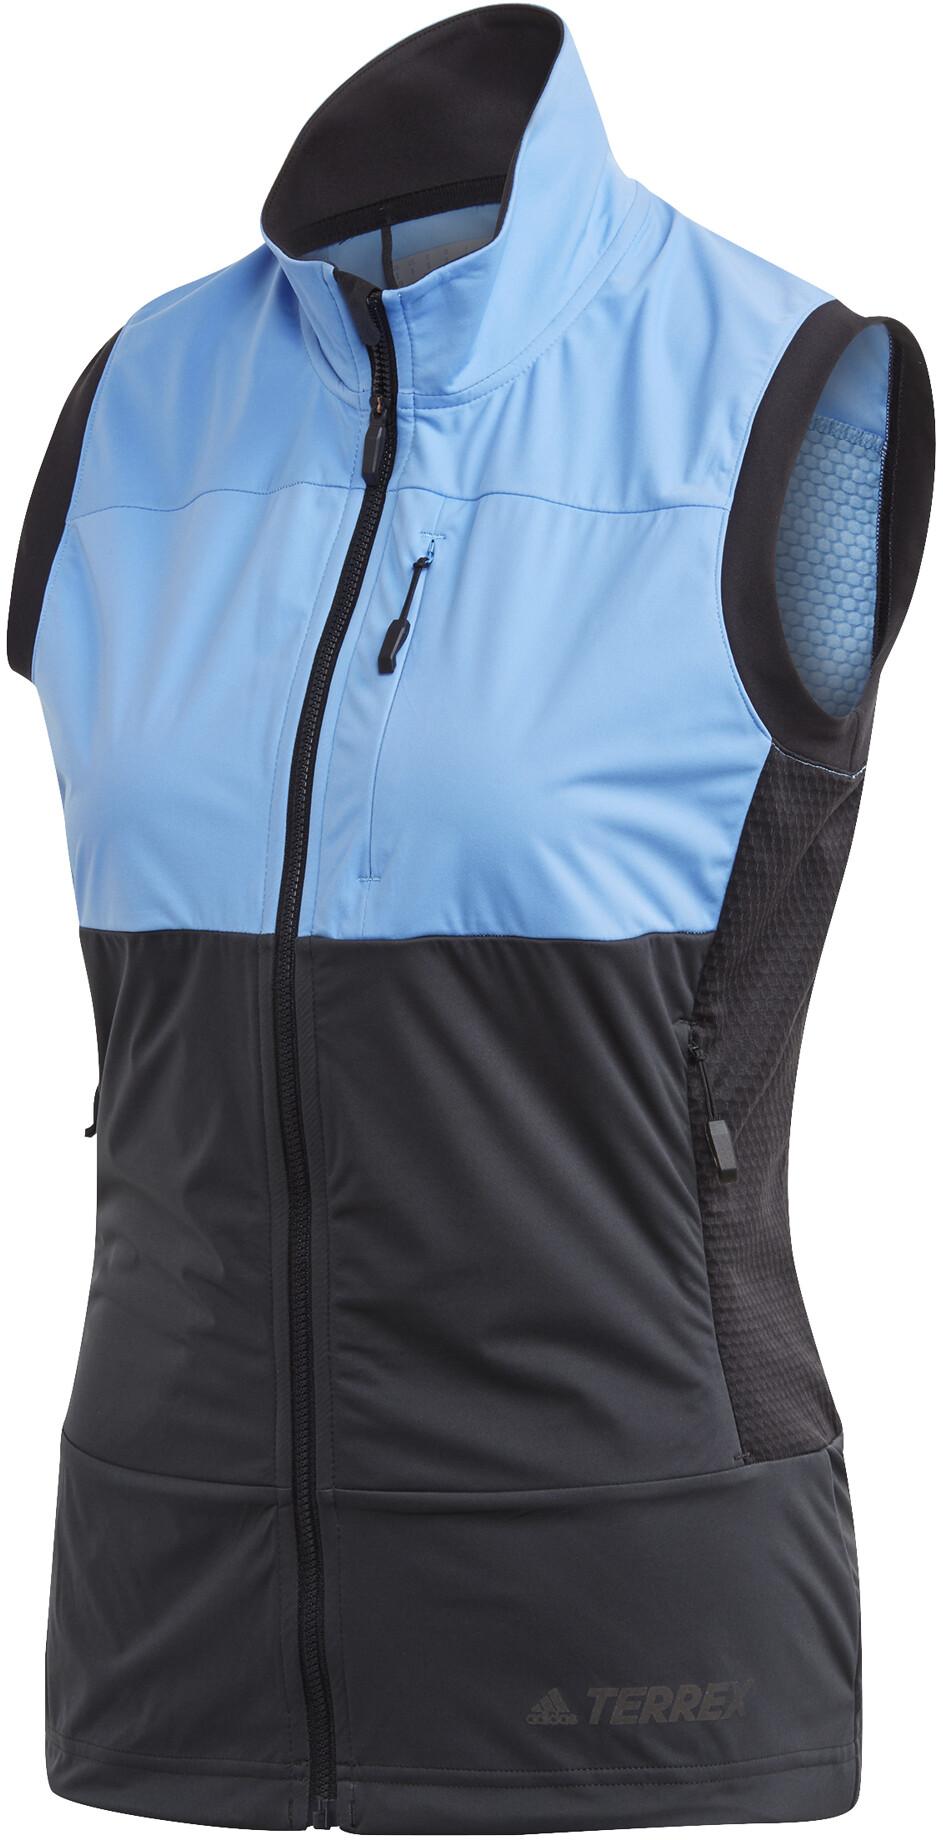 adidas TERREX Xperior Vest Damer, real blue/carbon | Vests